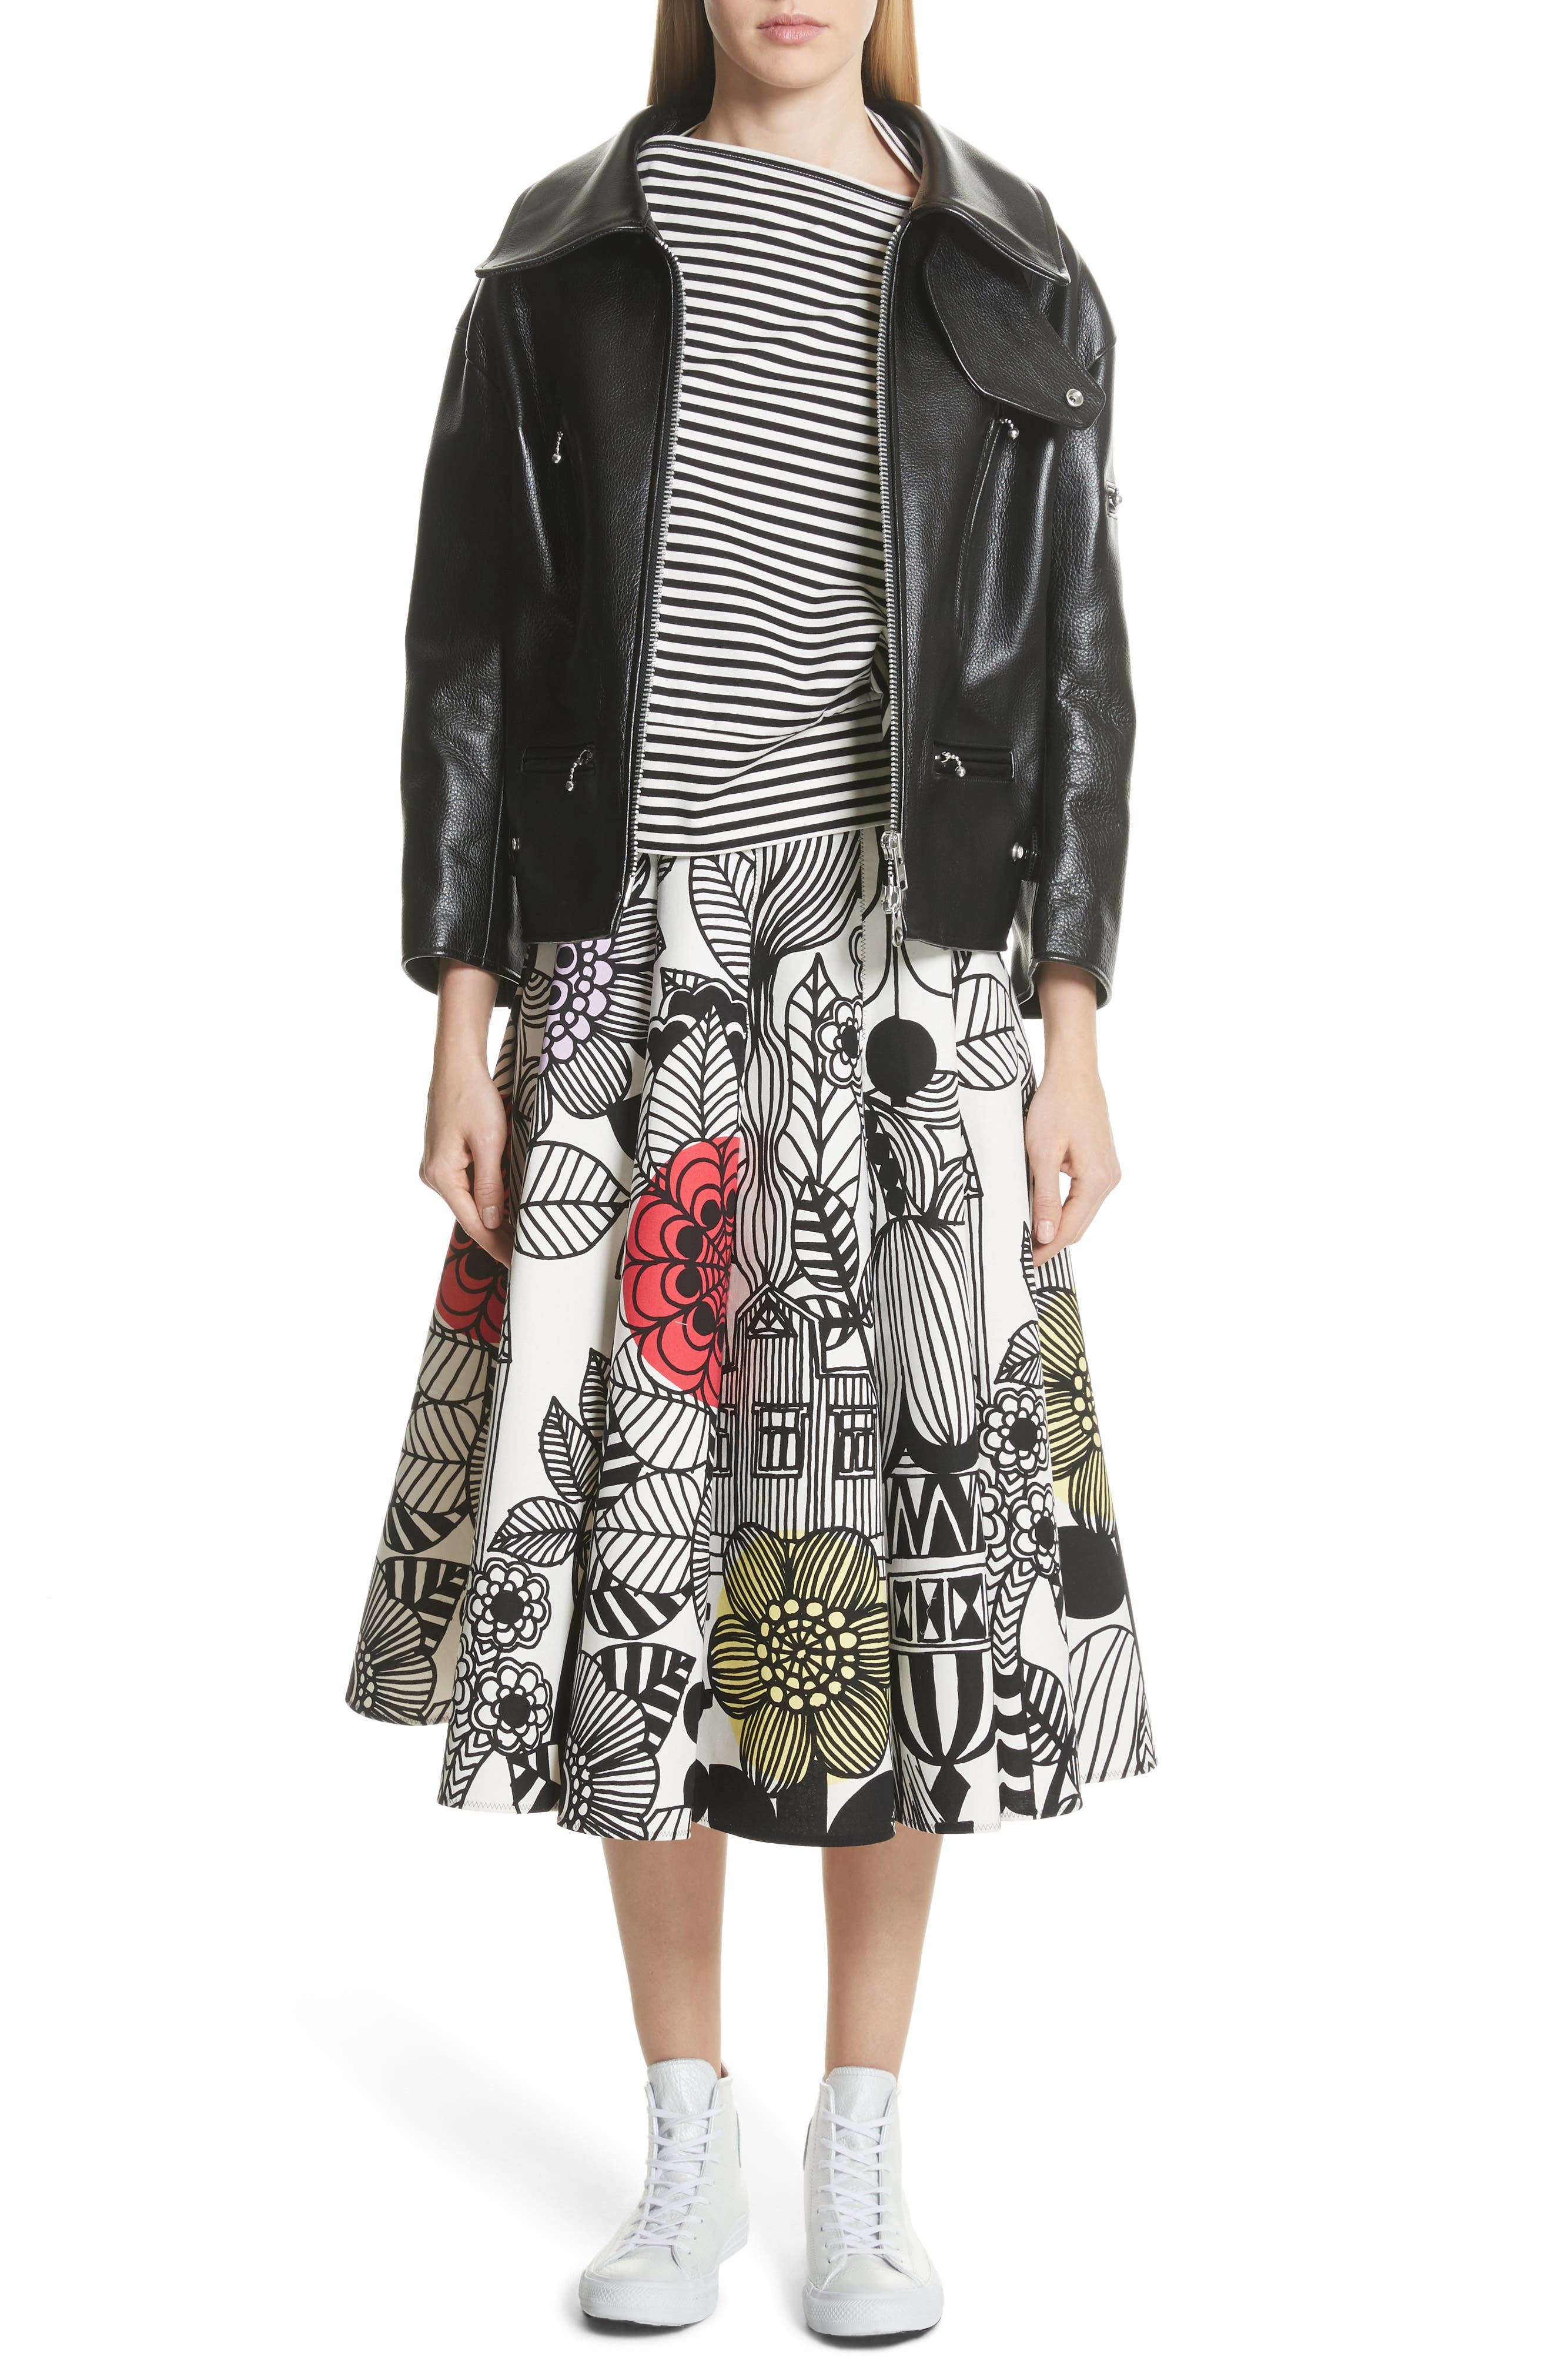 x Marimekko Vegetable Print Cotton Skirt,                             Alternate thumbnail 7, color,                             100